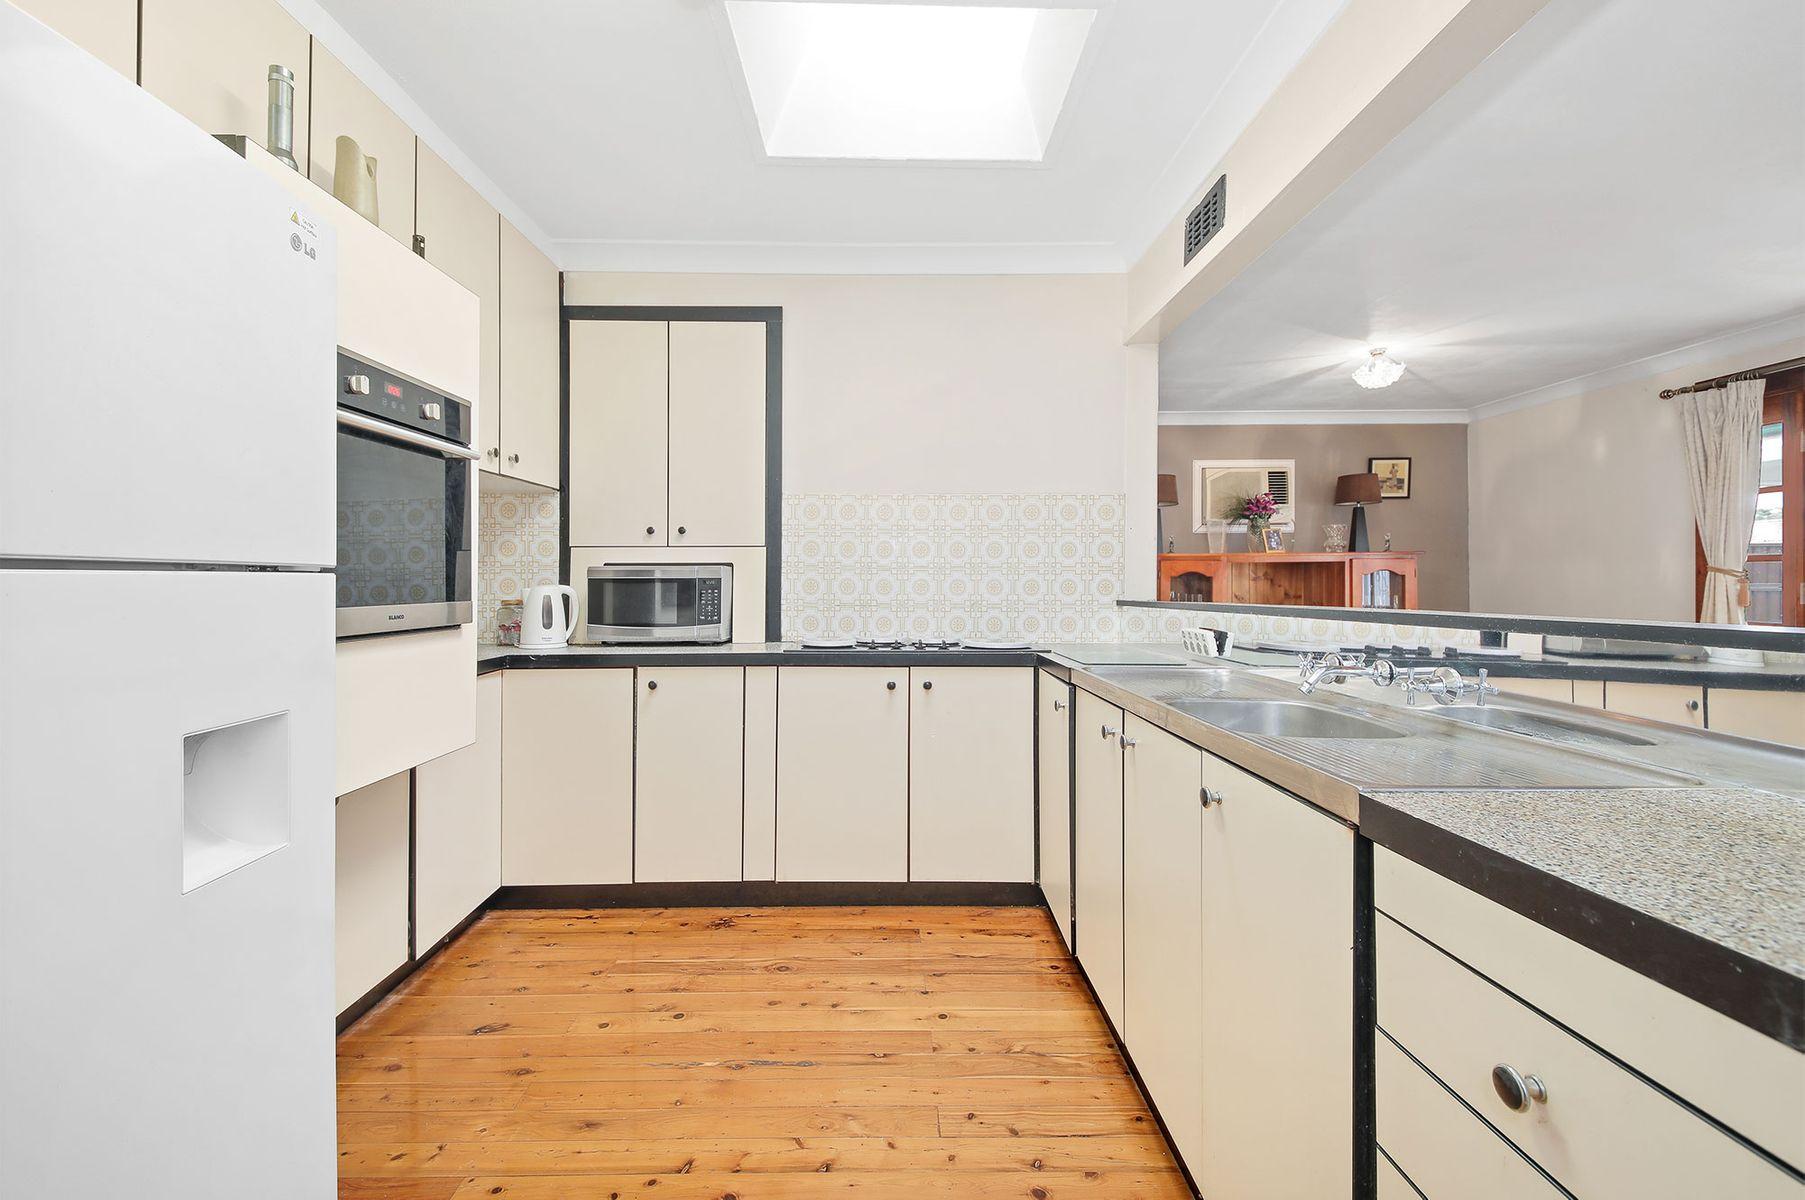 182 Ashford Avenue, Milperra, NSW 2214